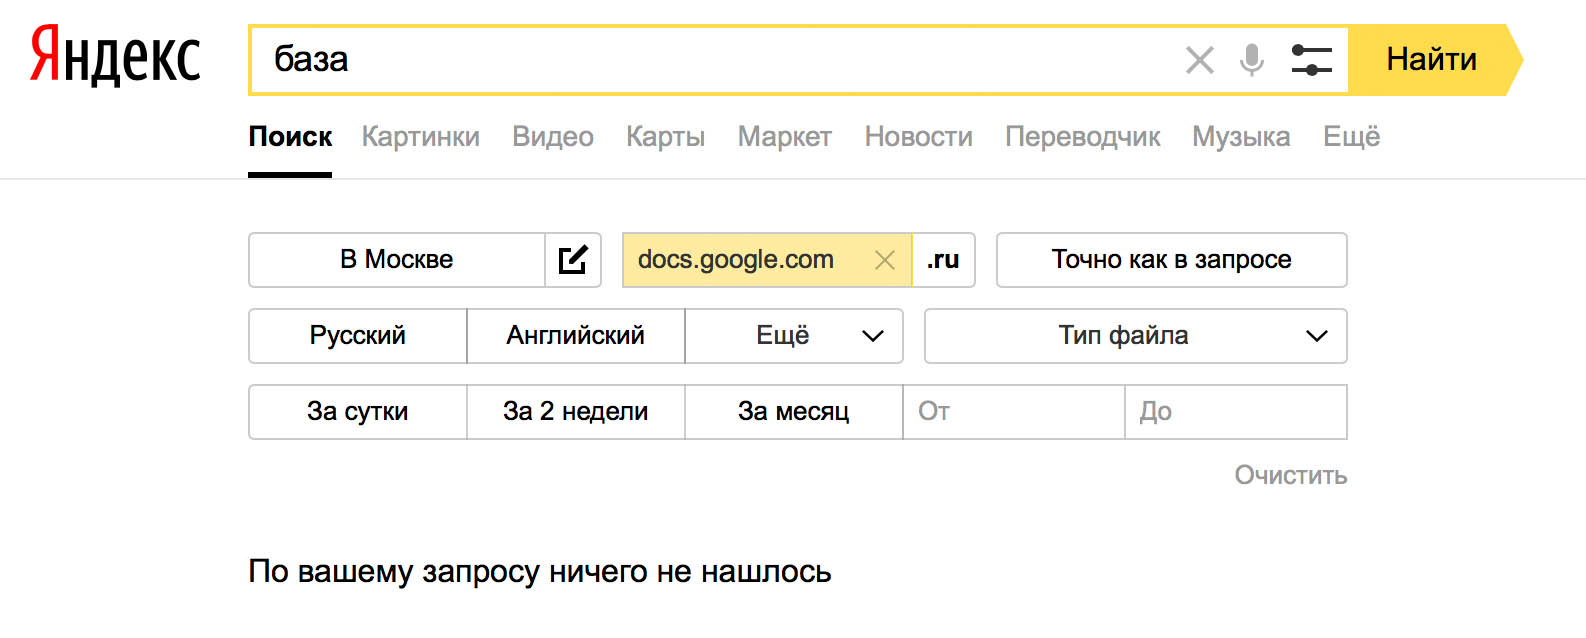 Яндекс отключил поиск по гугл-докам